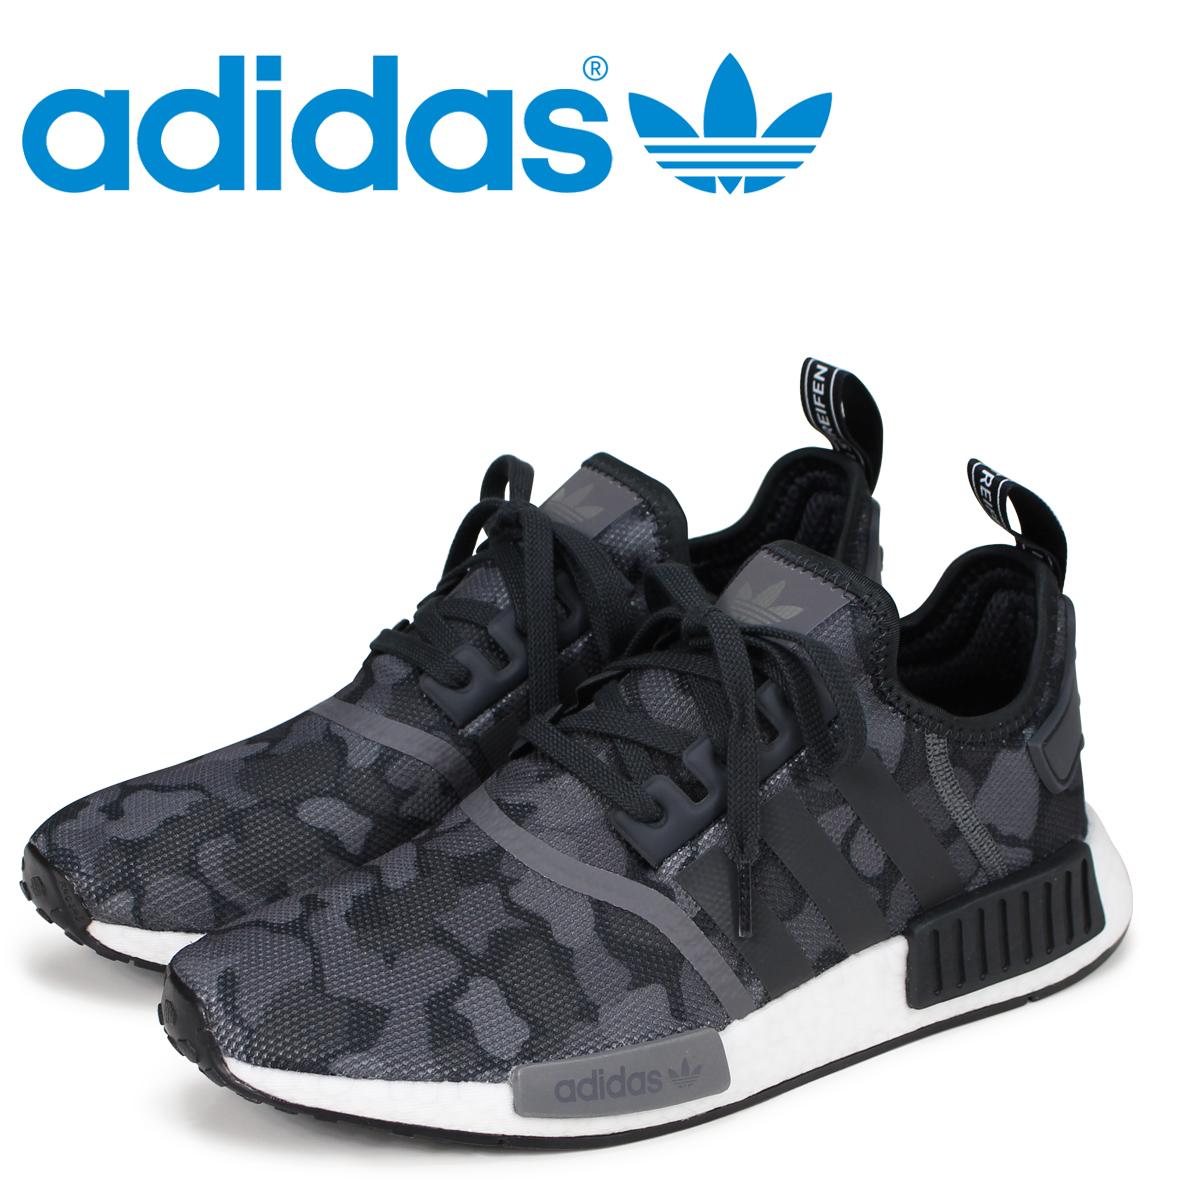 1fe7ab62b6 adidas Originals NMD R1 Adidas originals sneakers N M D nomad men D96616  black black